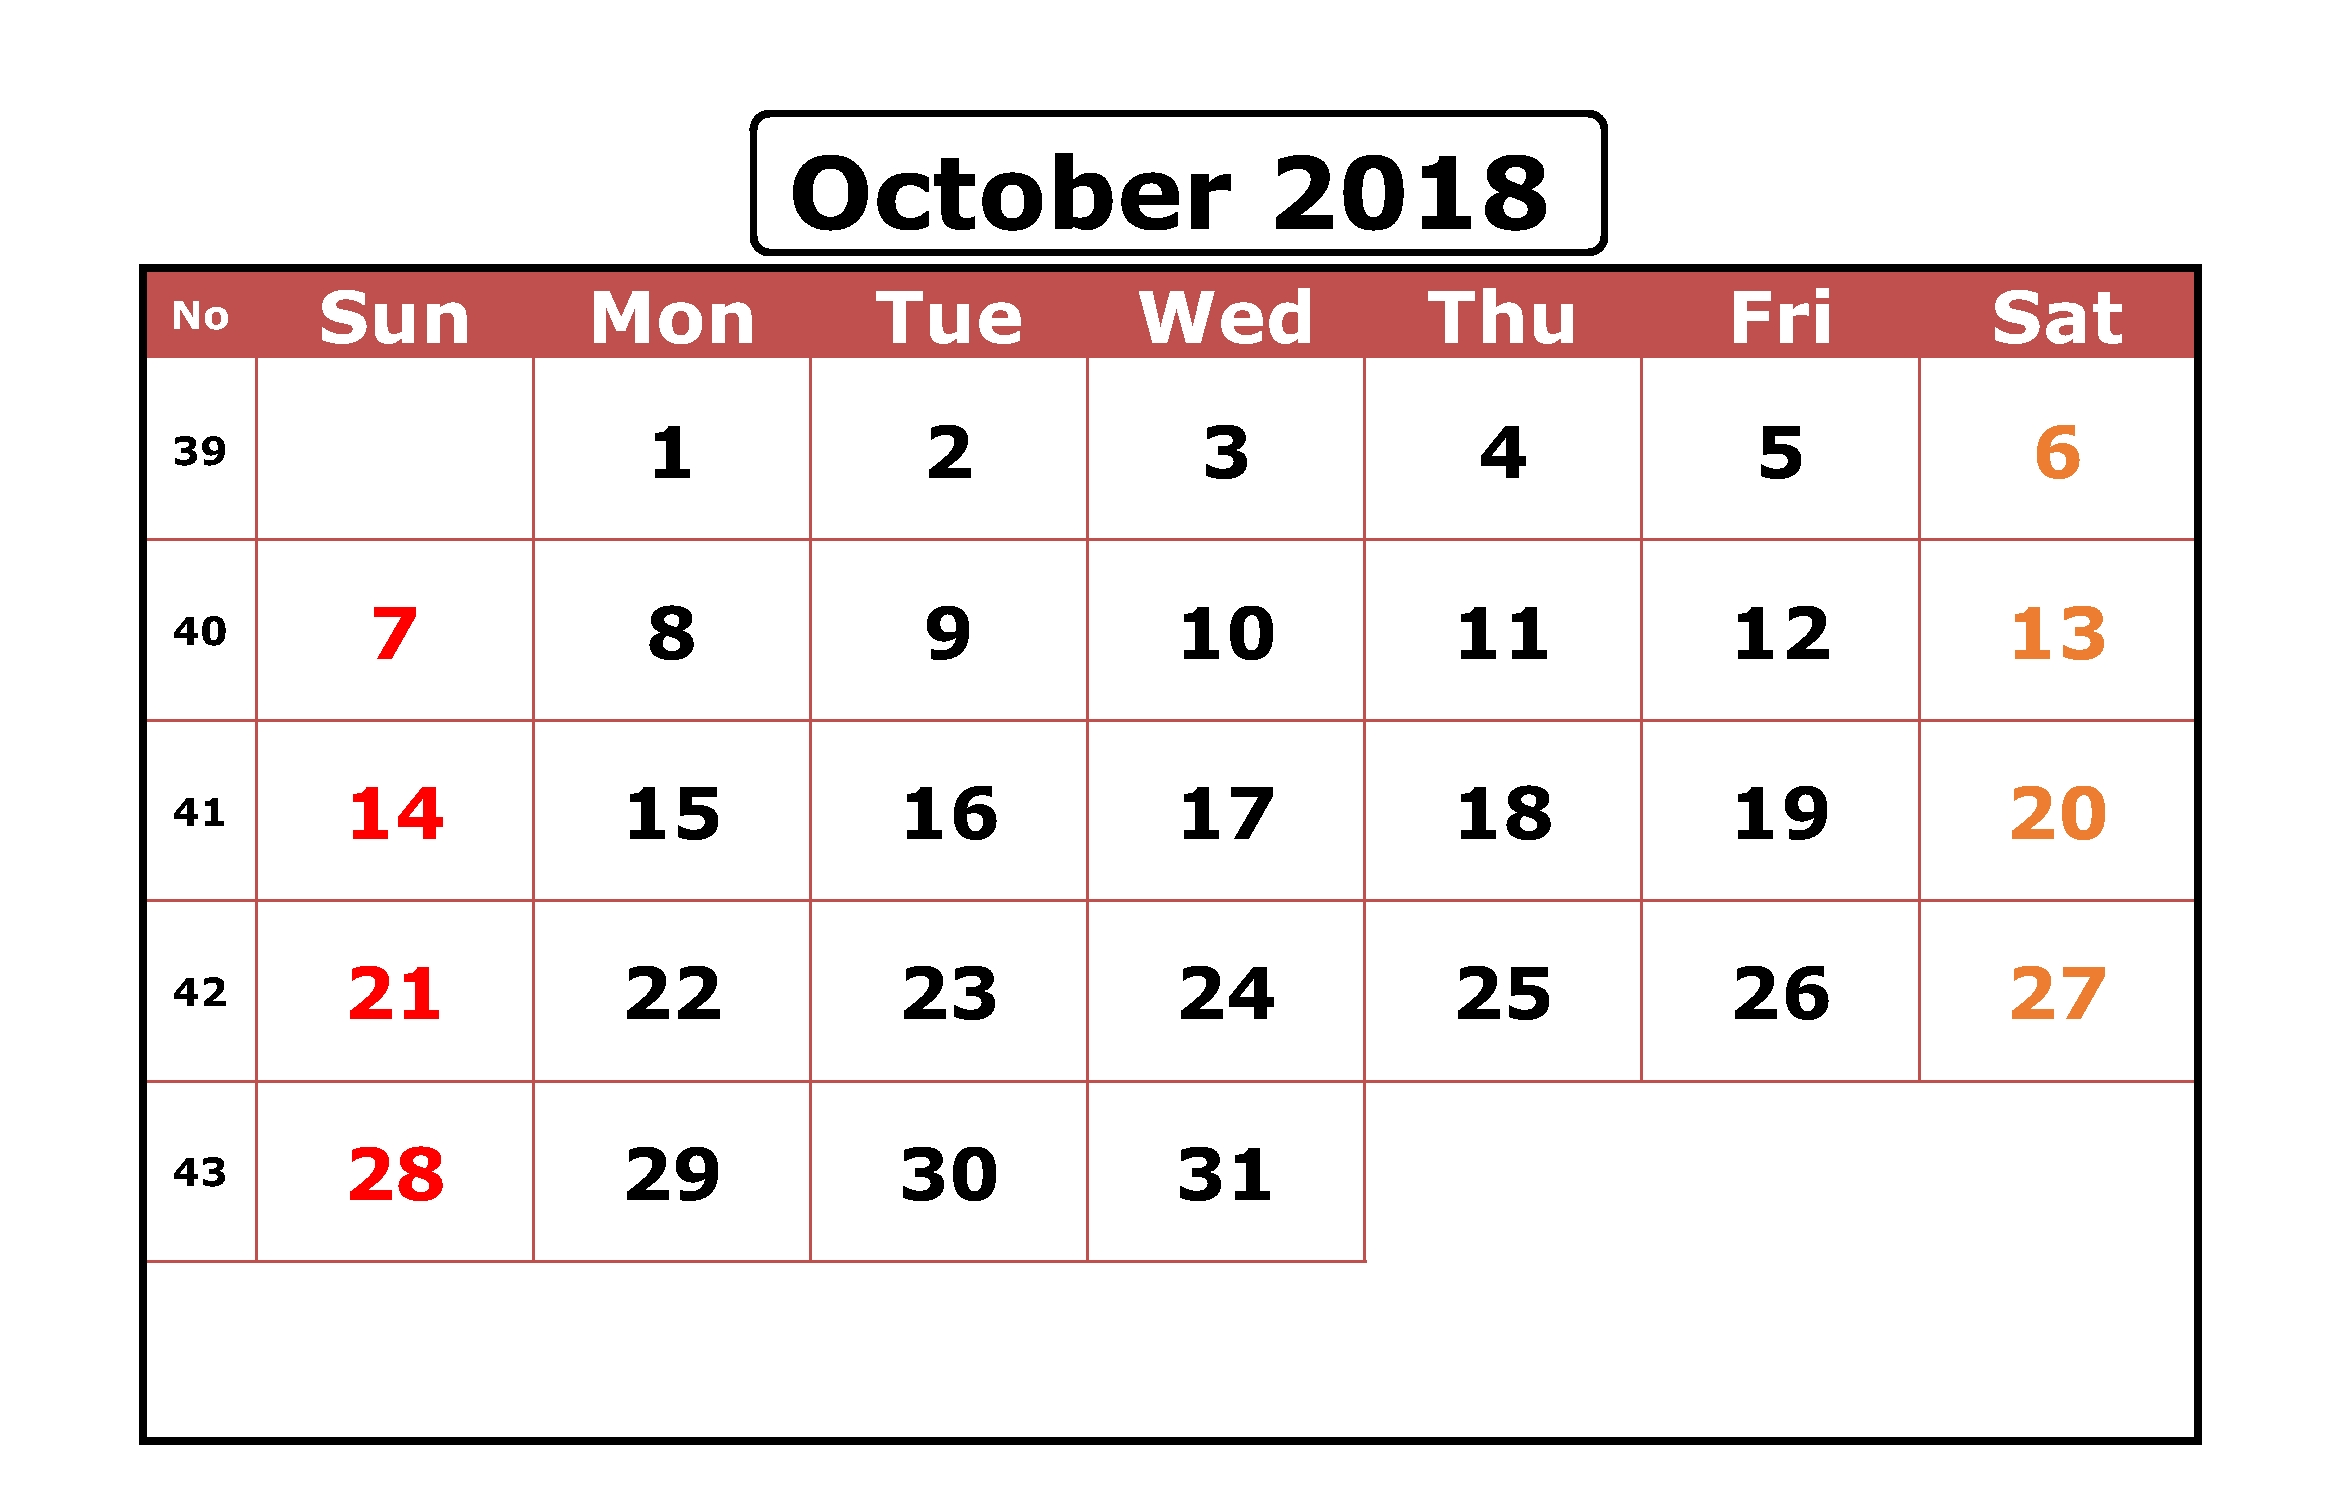 Excel October 2018 Spreadsheet Calendar | 2018 Printable